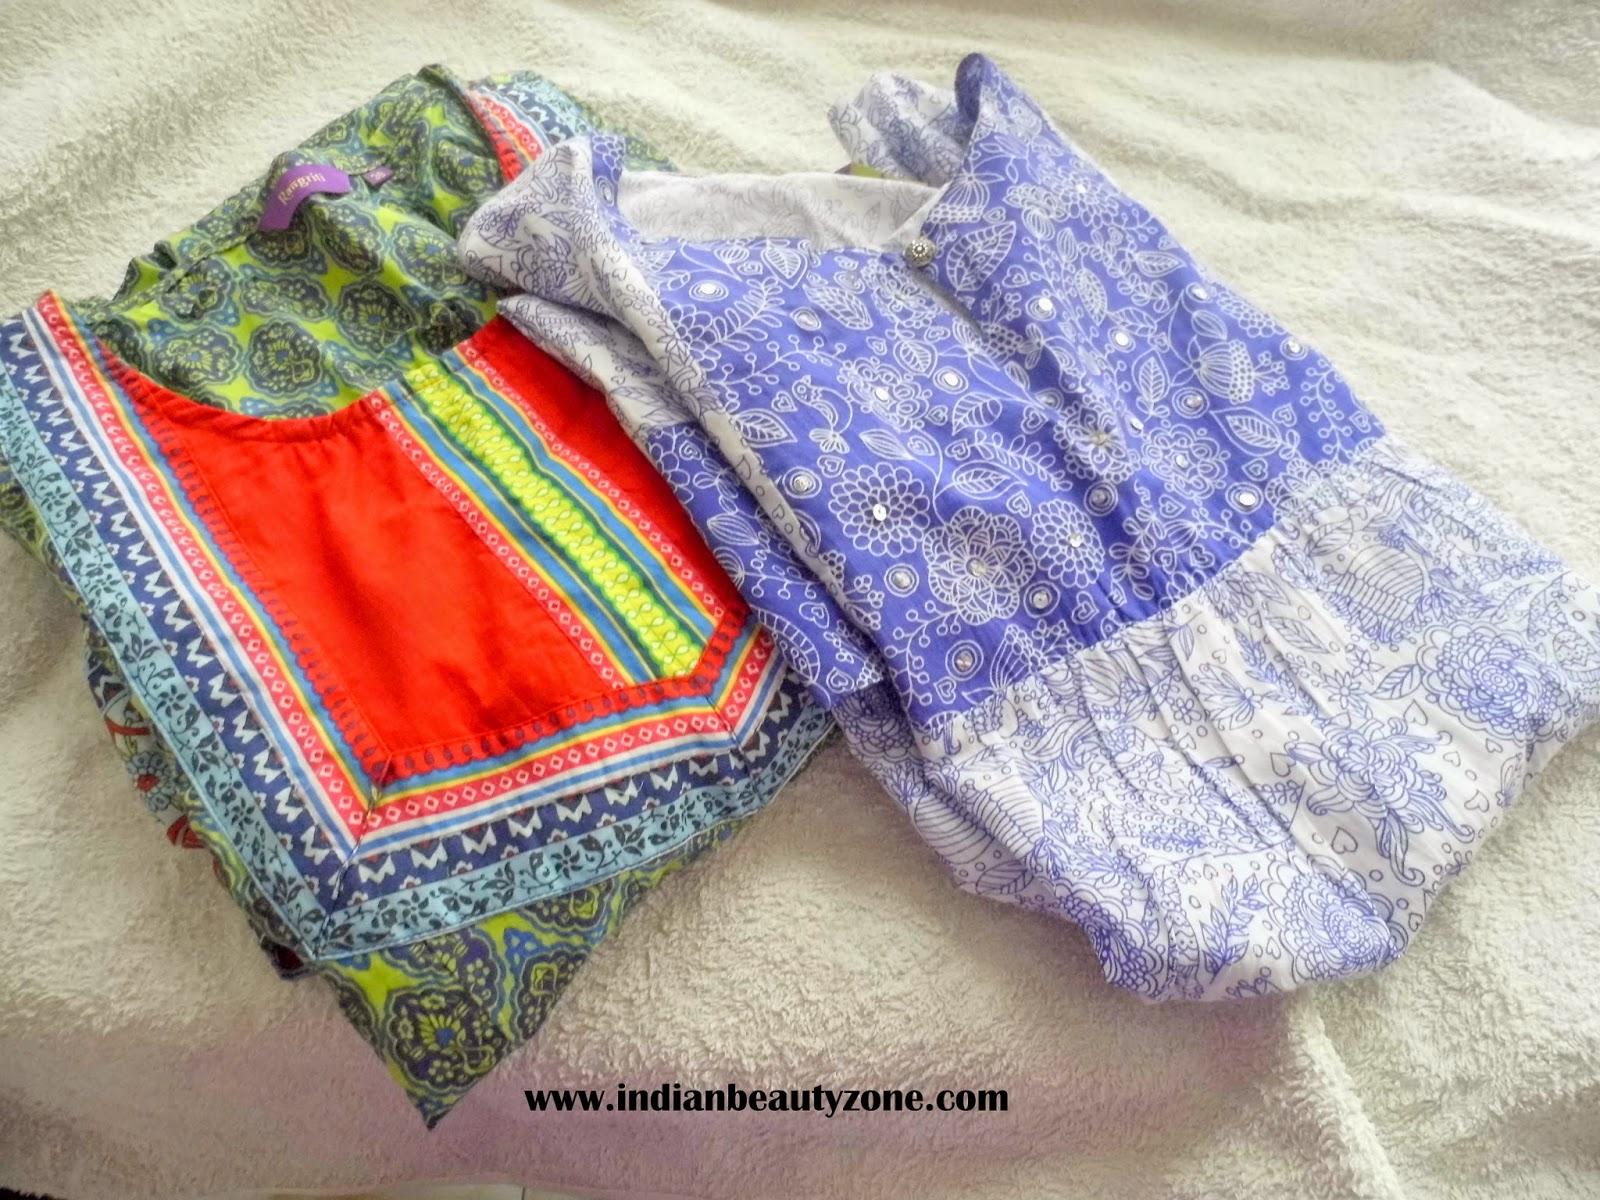 Clothing shop online, anarkali kurtha